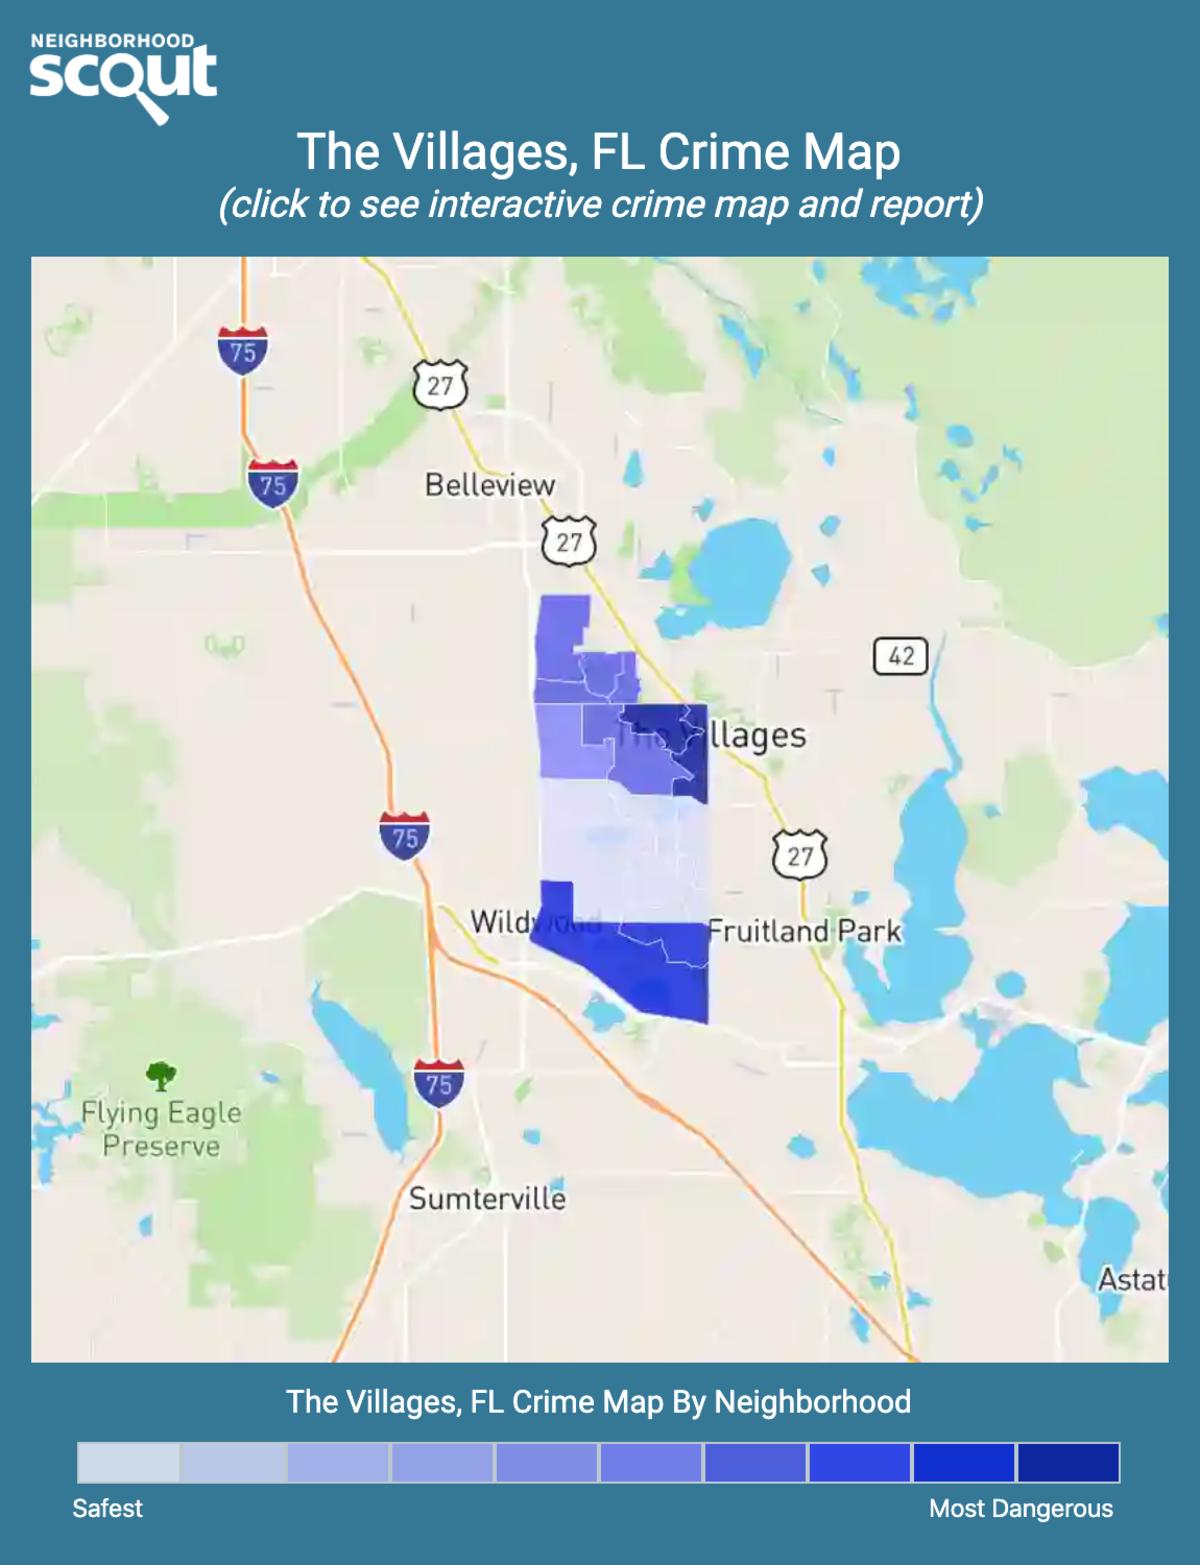 The Villages, Florida crime map